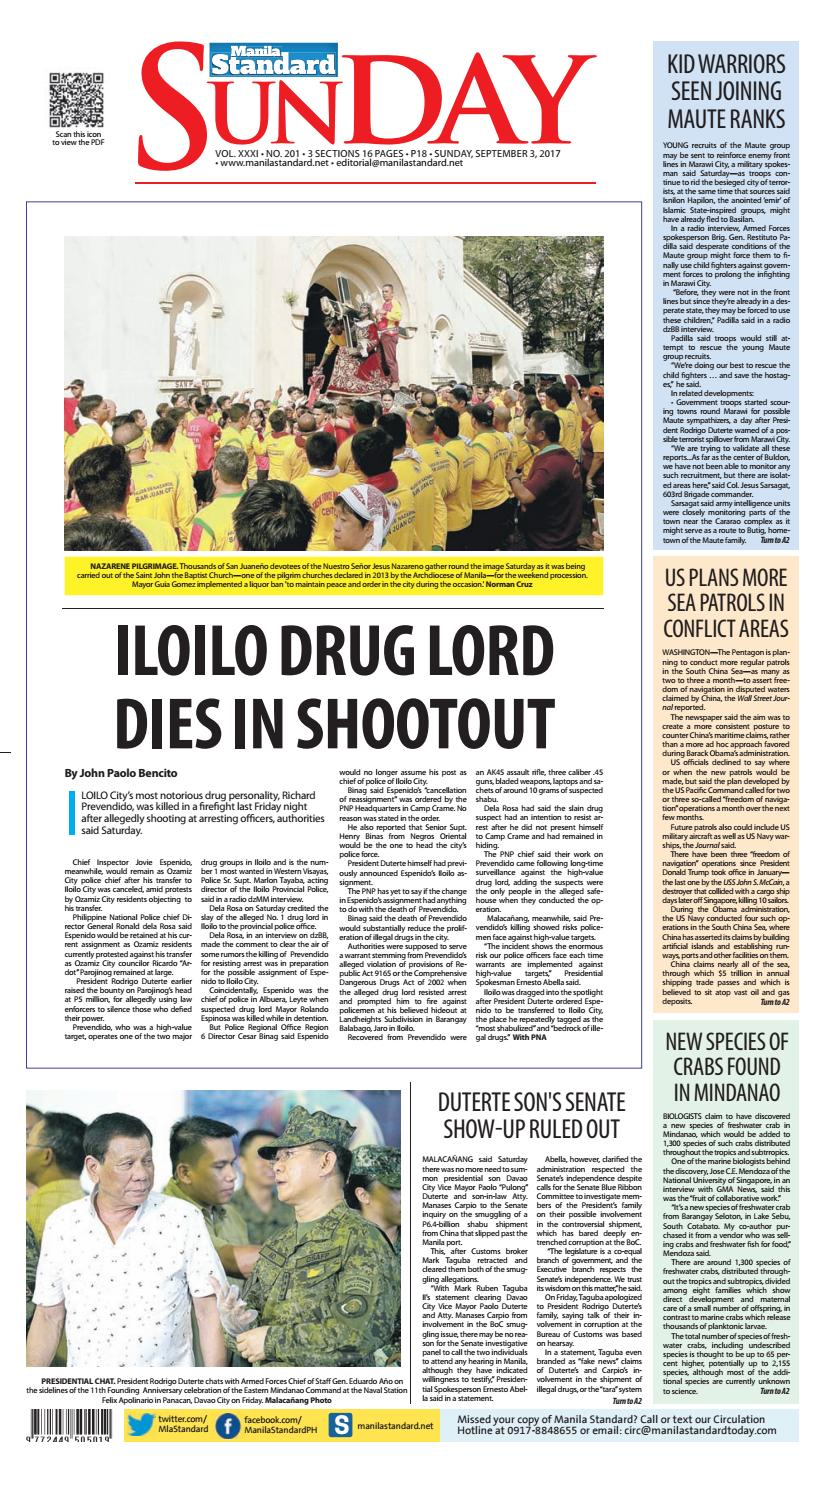 Manila Standard - 2017 September 03 - Sunday by Manila Standard - issuu